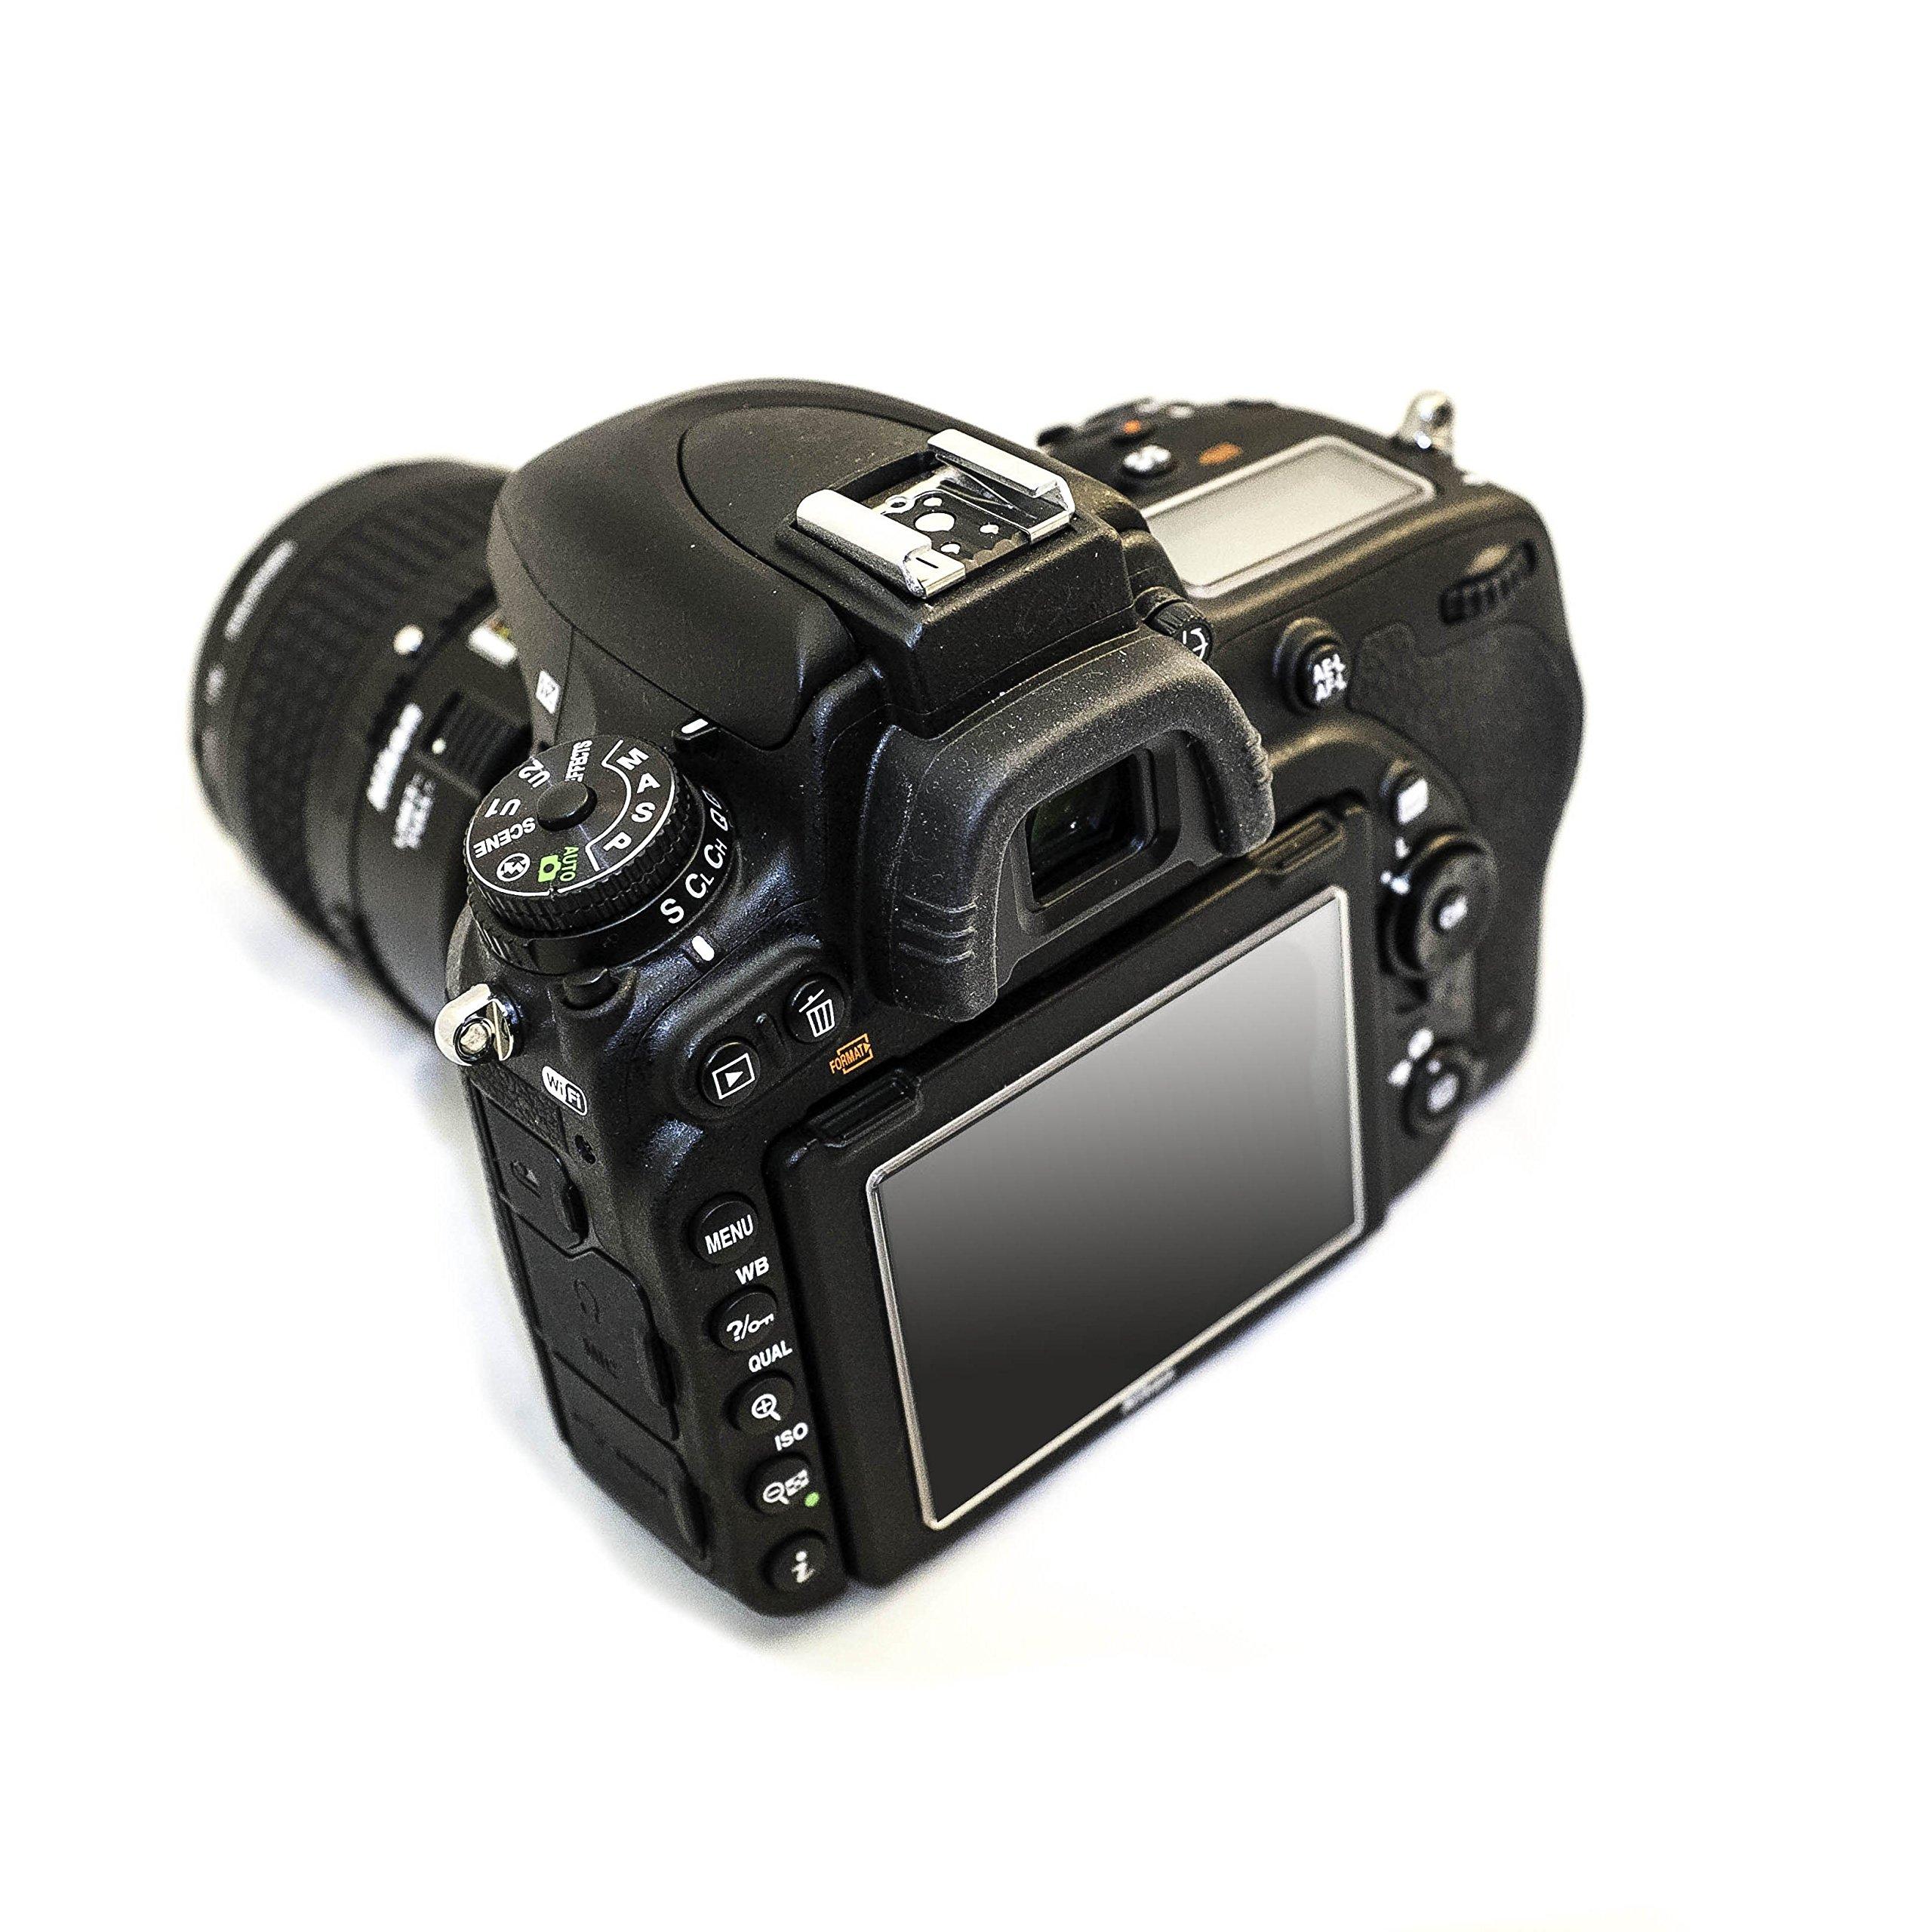 ACMAXX 3.2'' HARD LCD Screen ARMOR PROTECTOR for Nikon D750 DSLR digital Camera